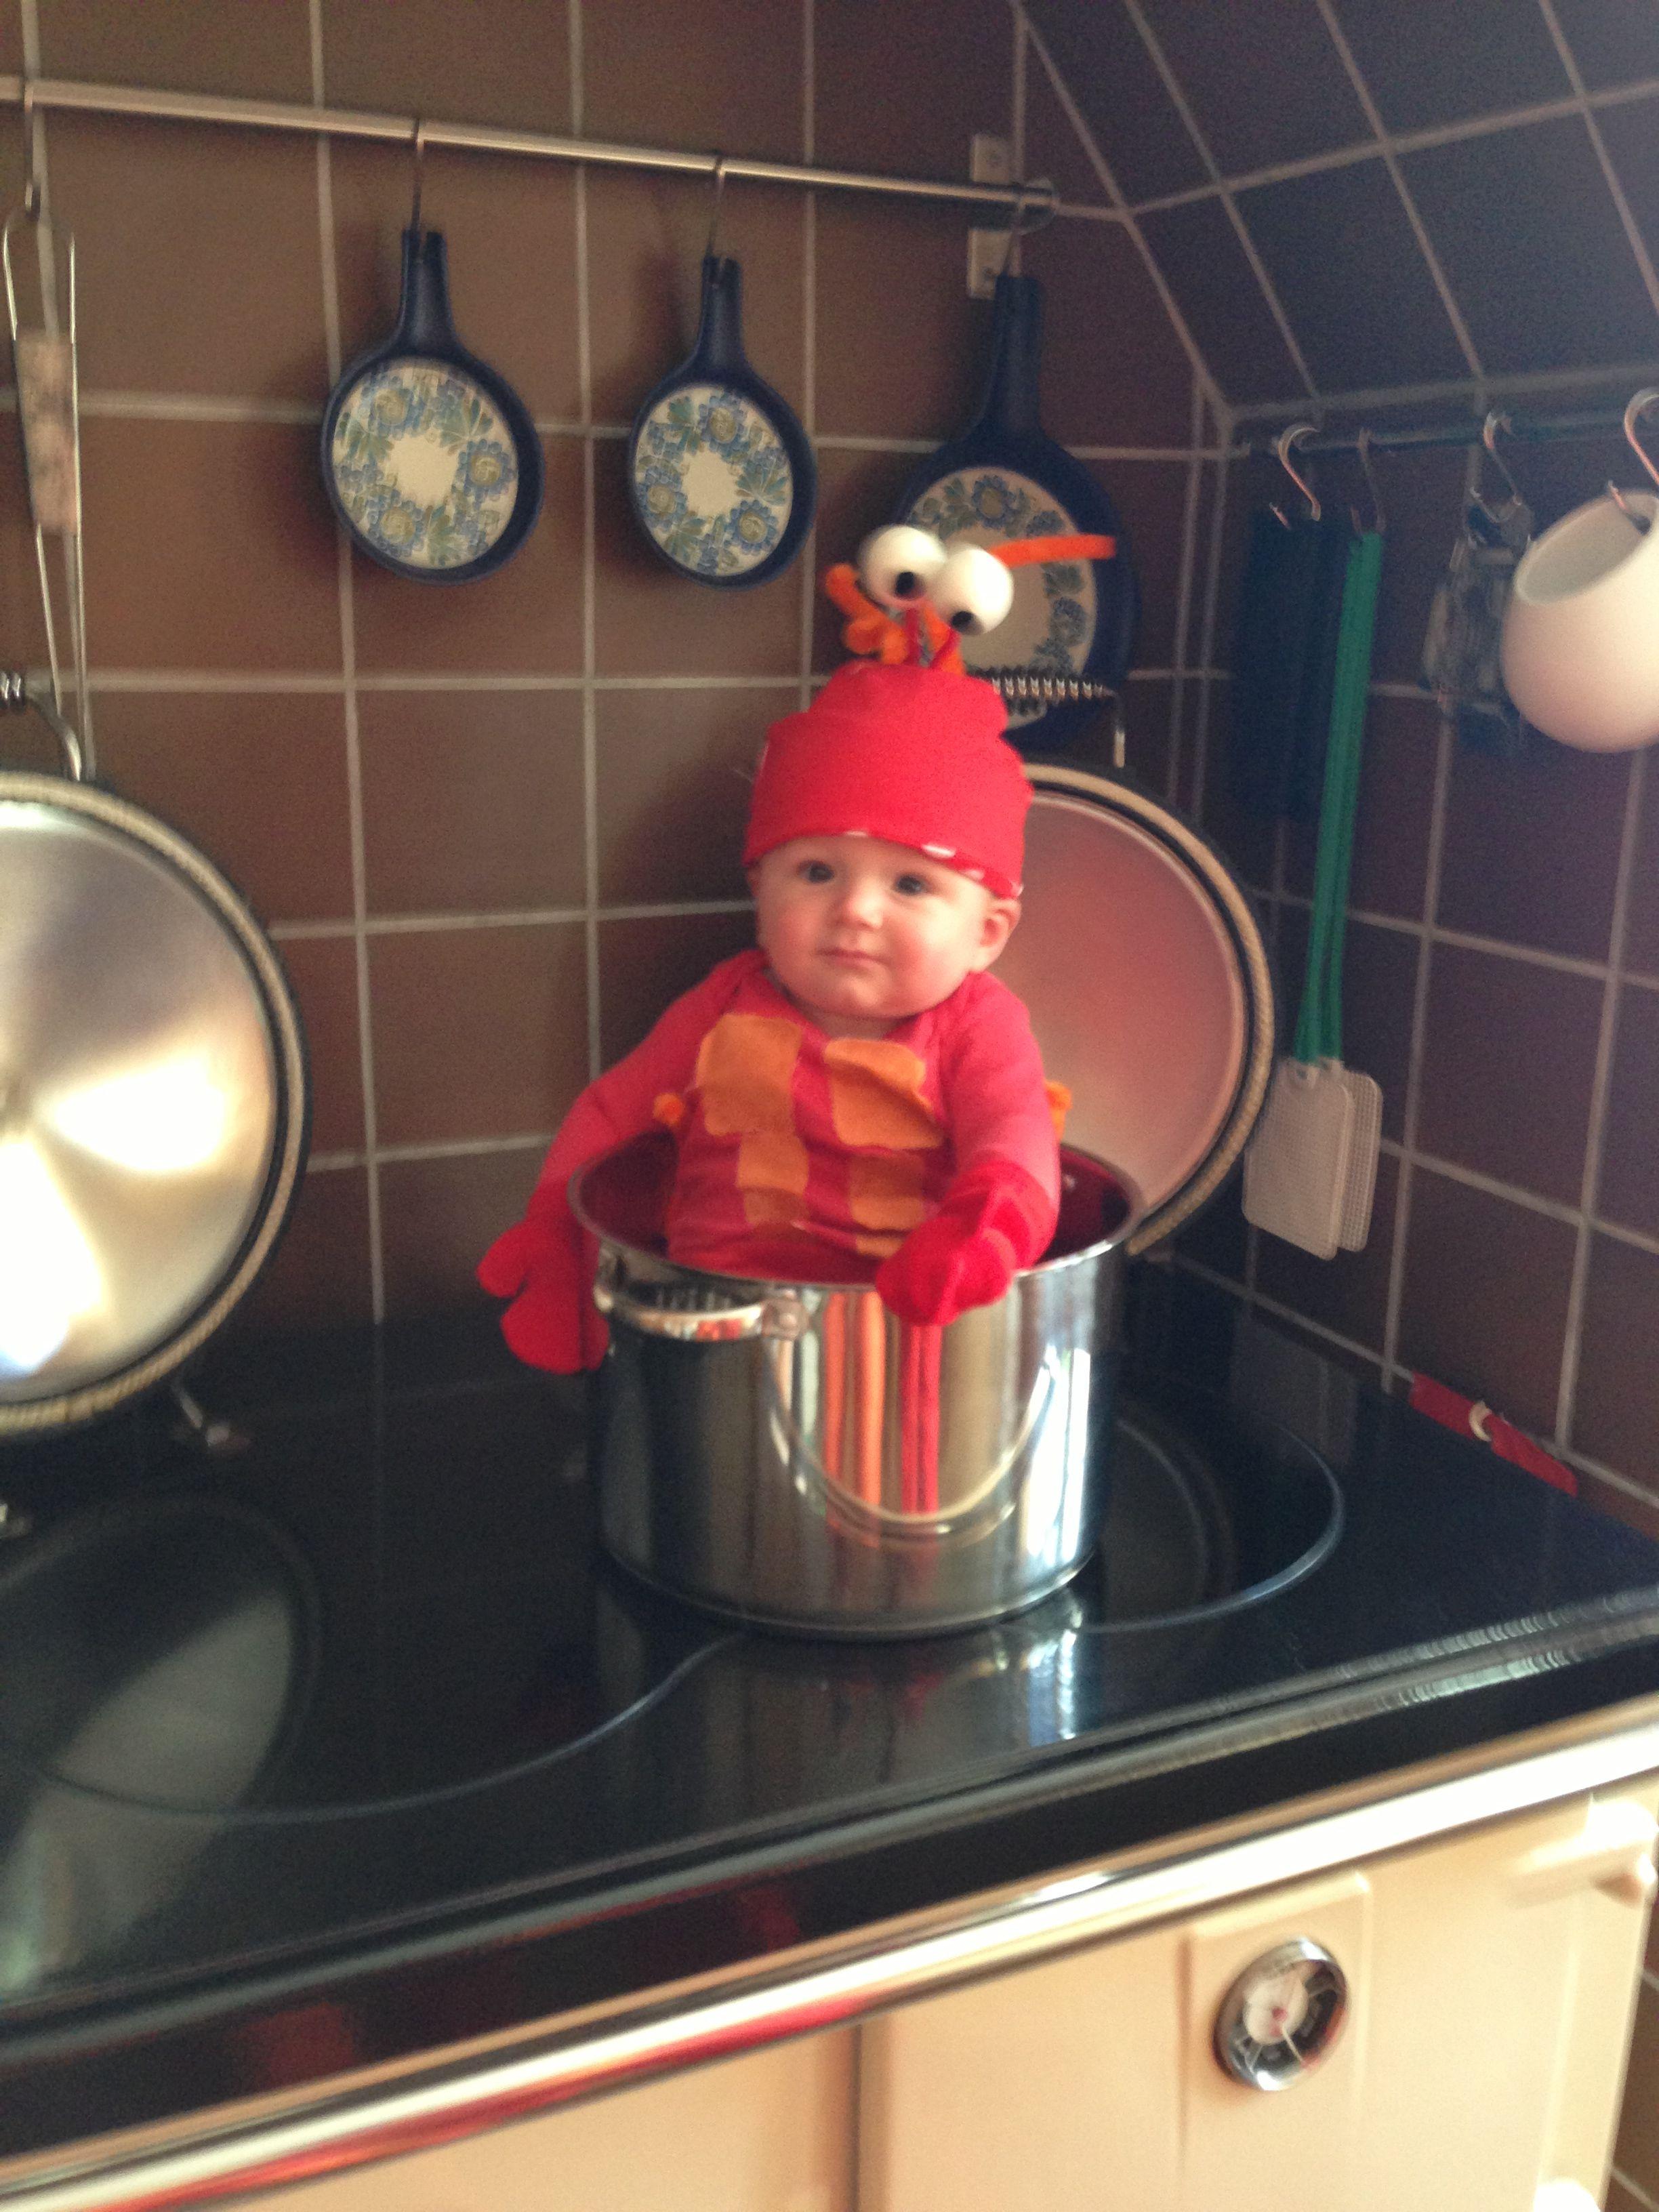 Baby lobster costume. Fun homemade children's costume ...